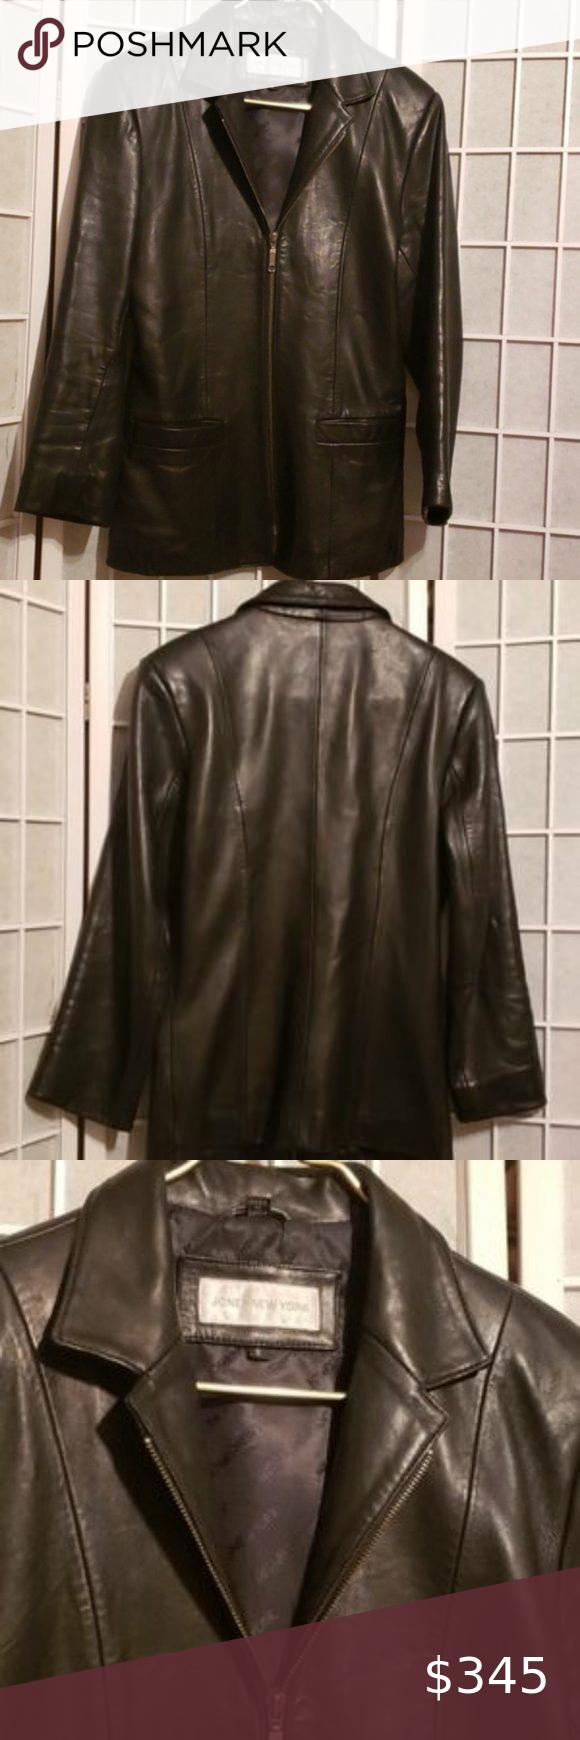 Jones New York Black Leather Zip Jacket Sz S In 2021 Womens Black Leather Jacket Grey Leather Jacket Black Leather Coat [ 1740 x 580 Pixel ]